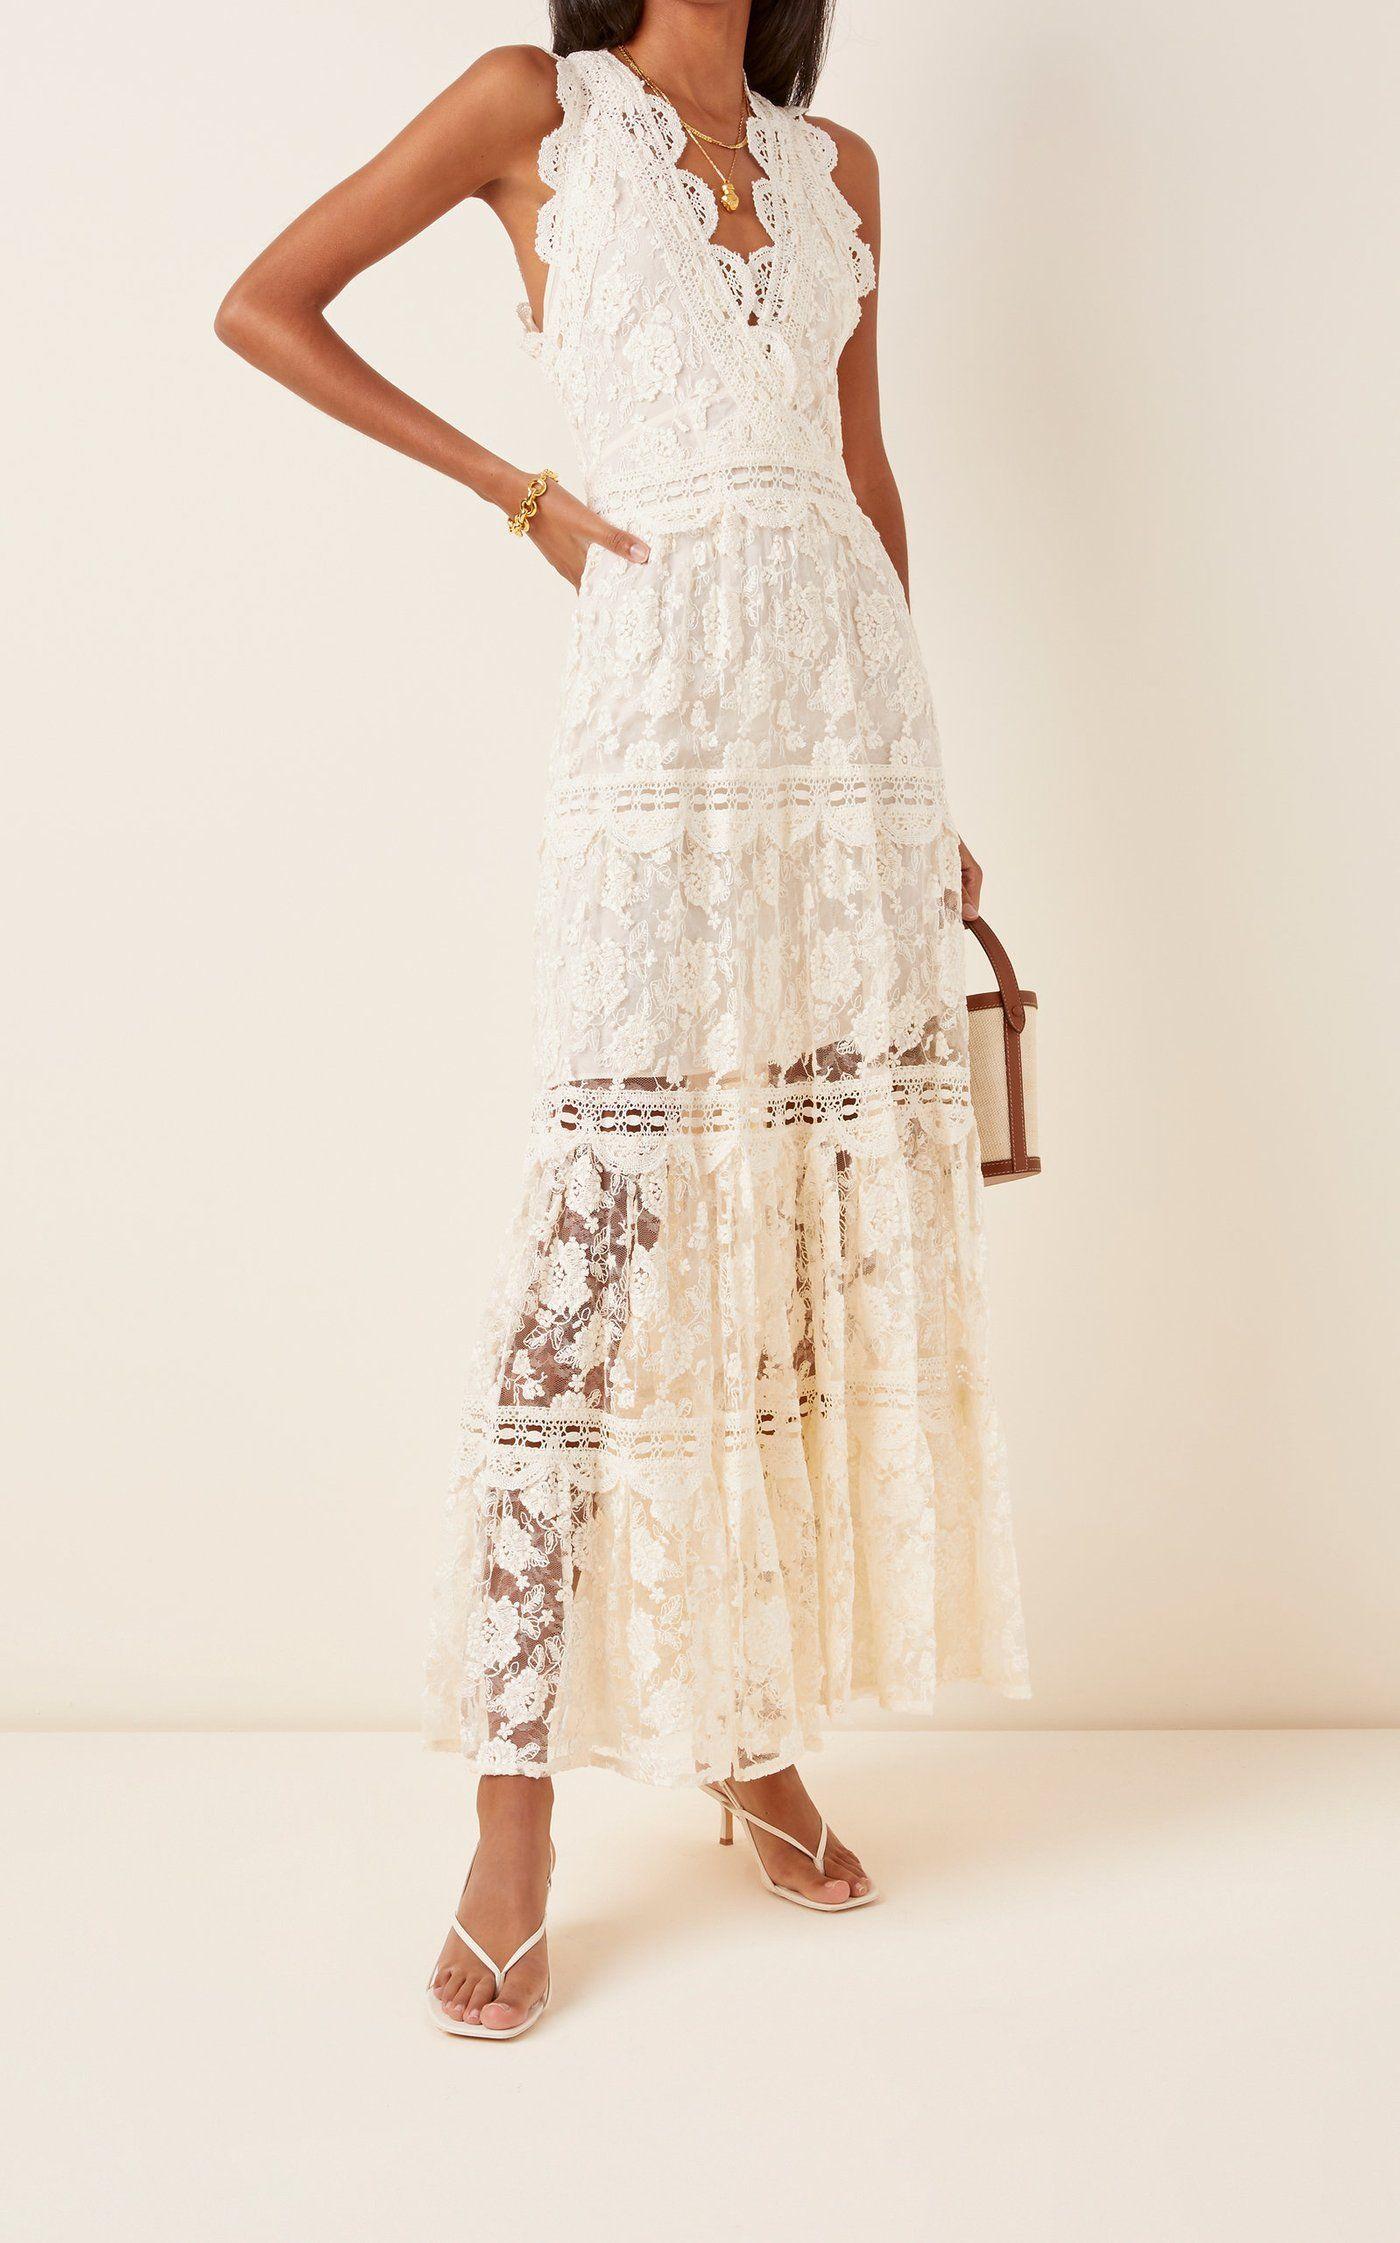 Havana Lace Maxi Dress By Alexis Moda Operandi White Lace Maxi Dress Lace Dress Vintage Lace Maxi Dress [ 2243 x 1400 Pixel ]